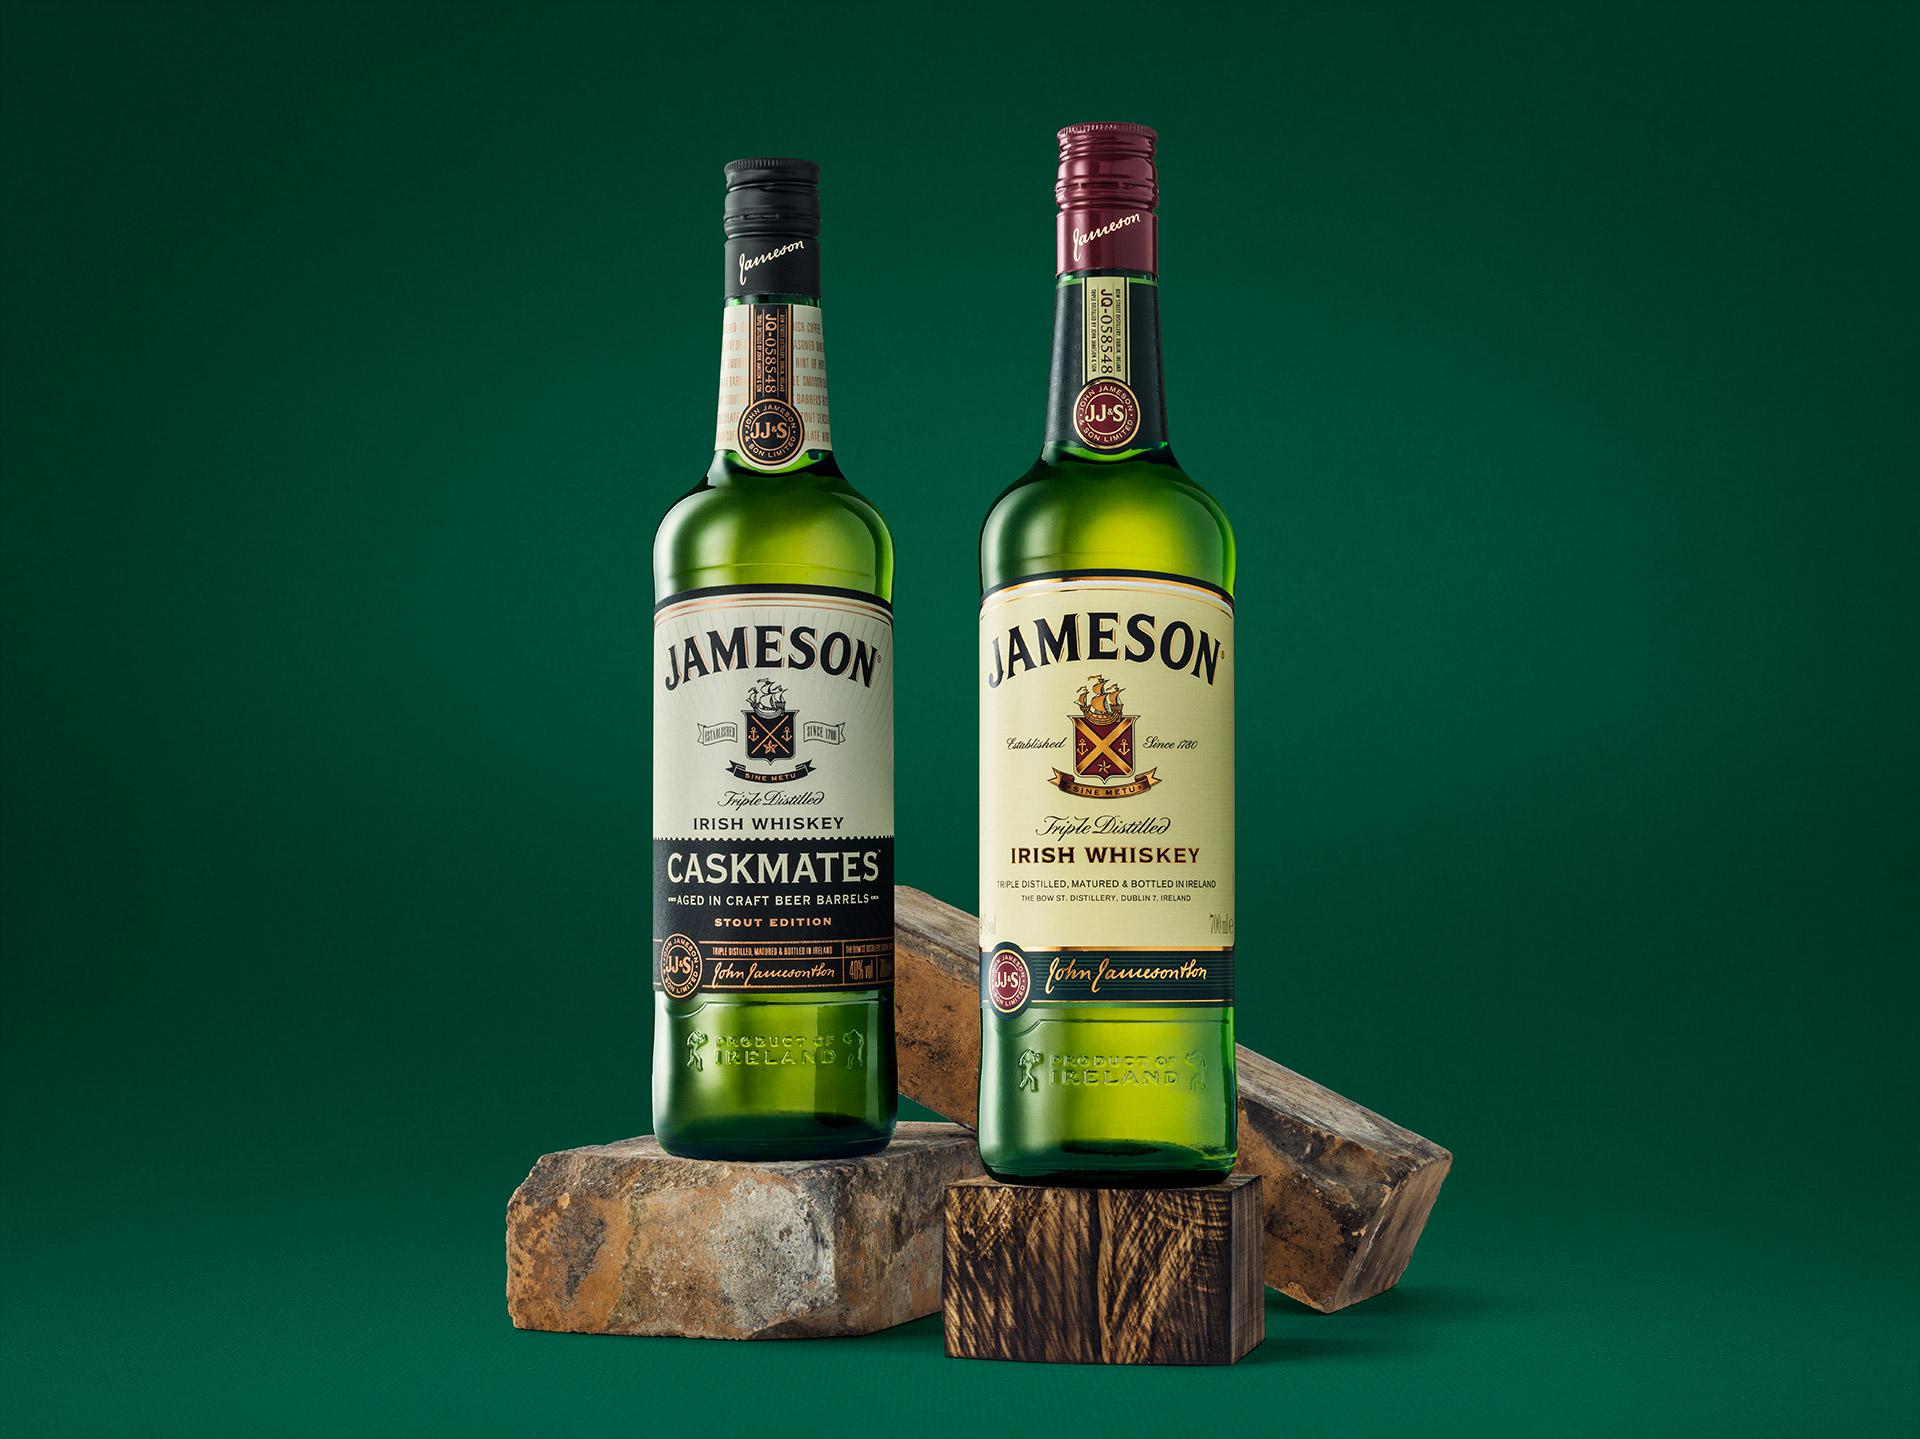 jameson_corporate_family_3_green_WEB.jpg